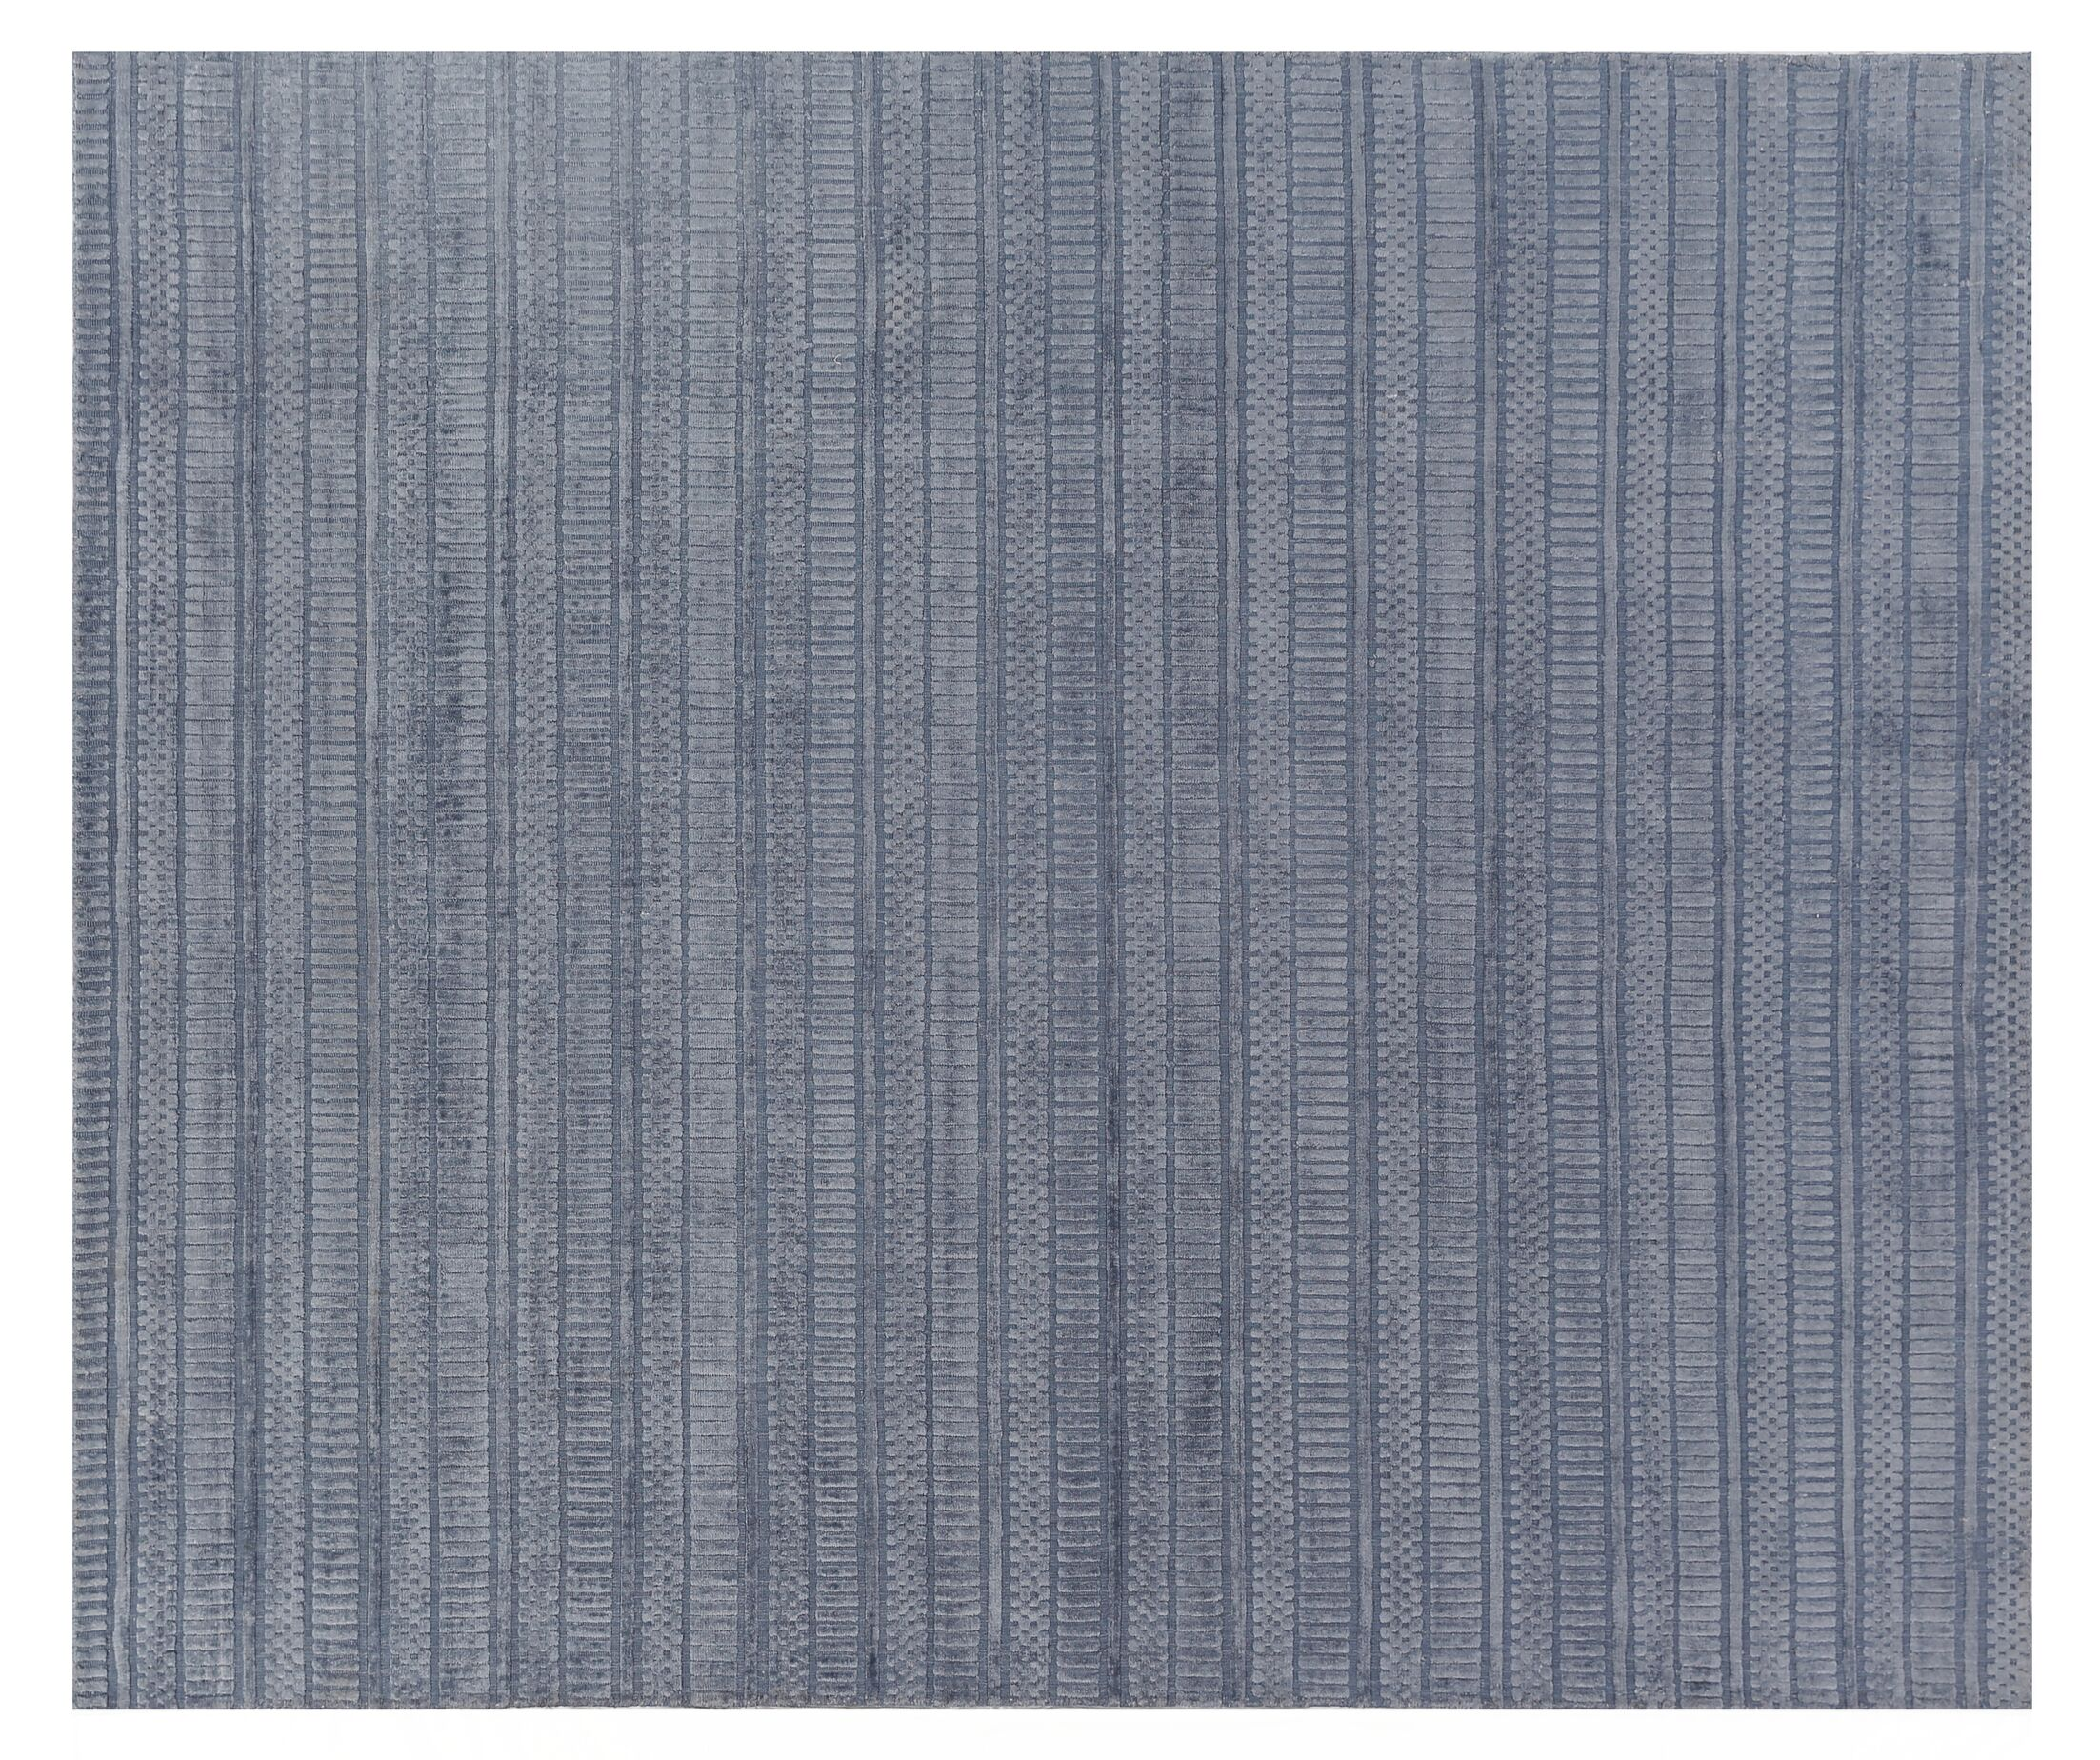 Addison Hand-Woven Gray Area Rug Rug Size: Rectangle6' x 9'